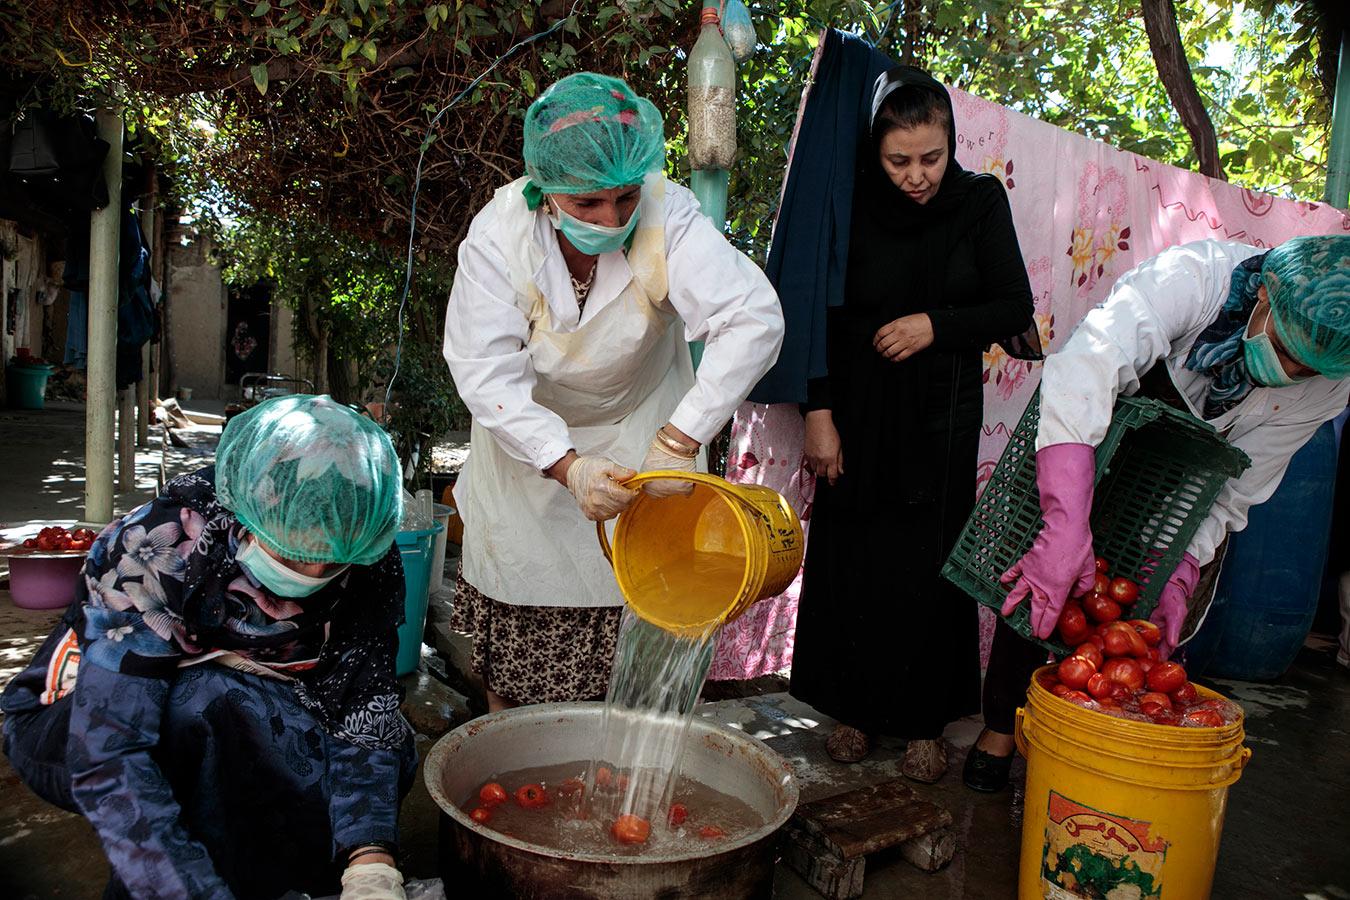 afghanistan-weat-photoslideshow-4-03052020.jpg